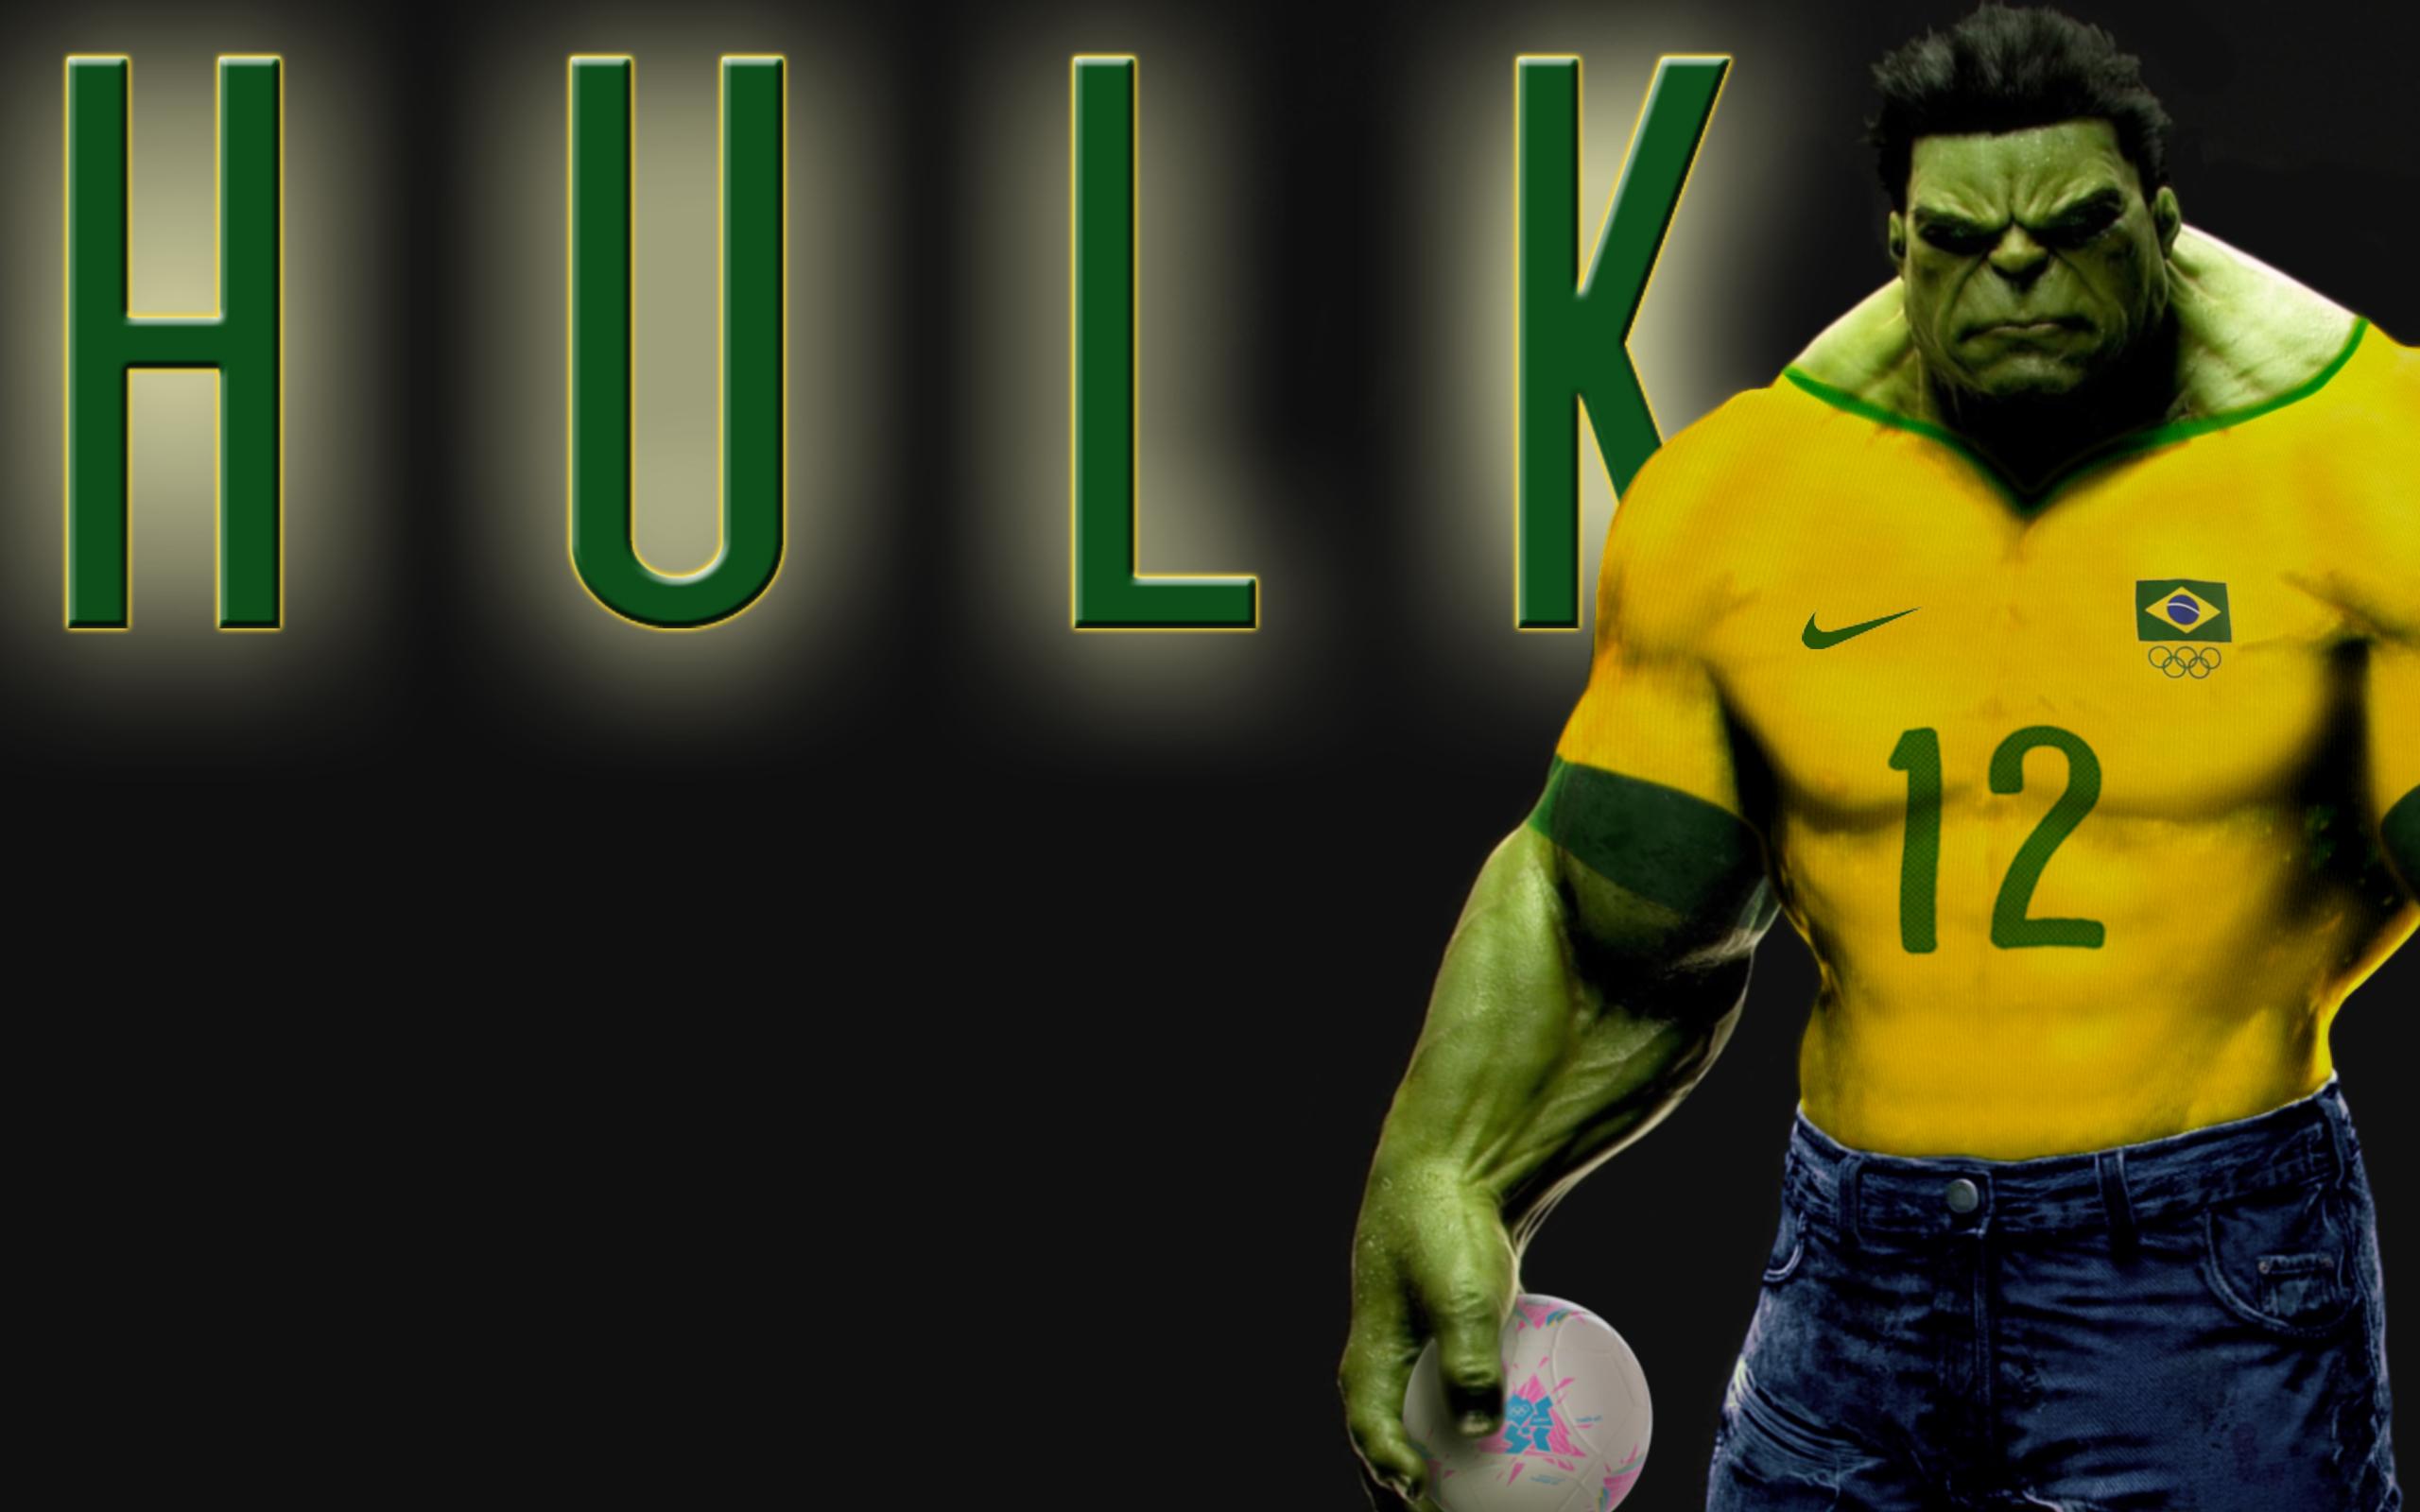 Hulk Wallpaper soccer